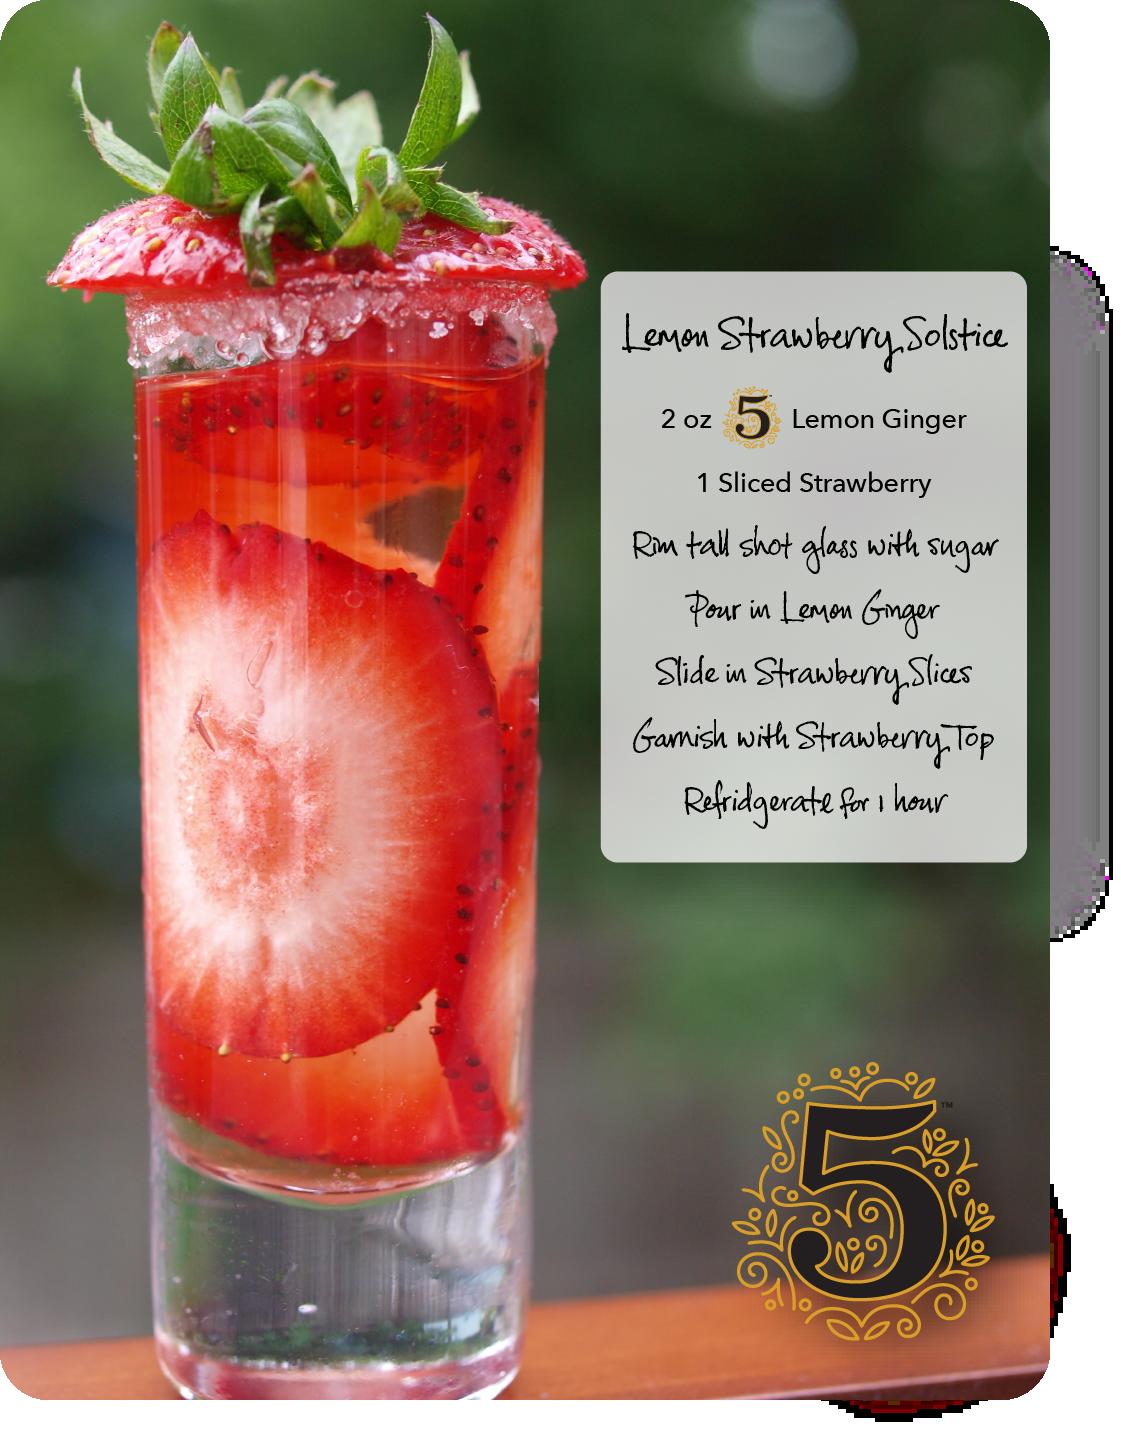 Lemon Strawberry Solstice.png